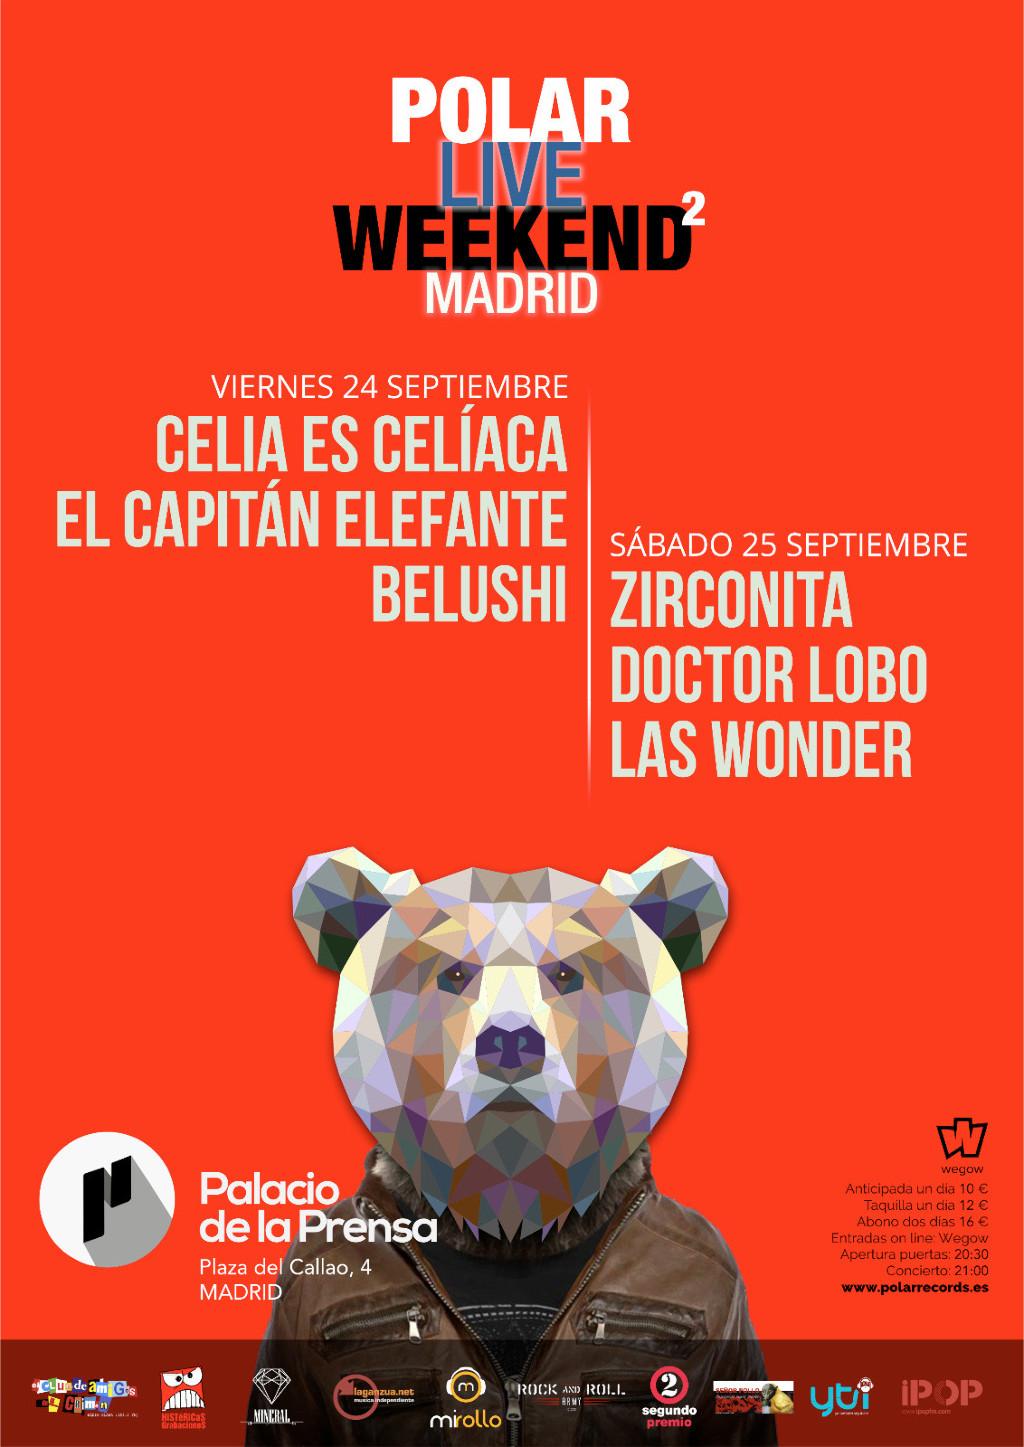 Polar Live Weekend 2 Madrid